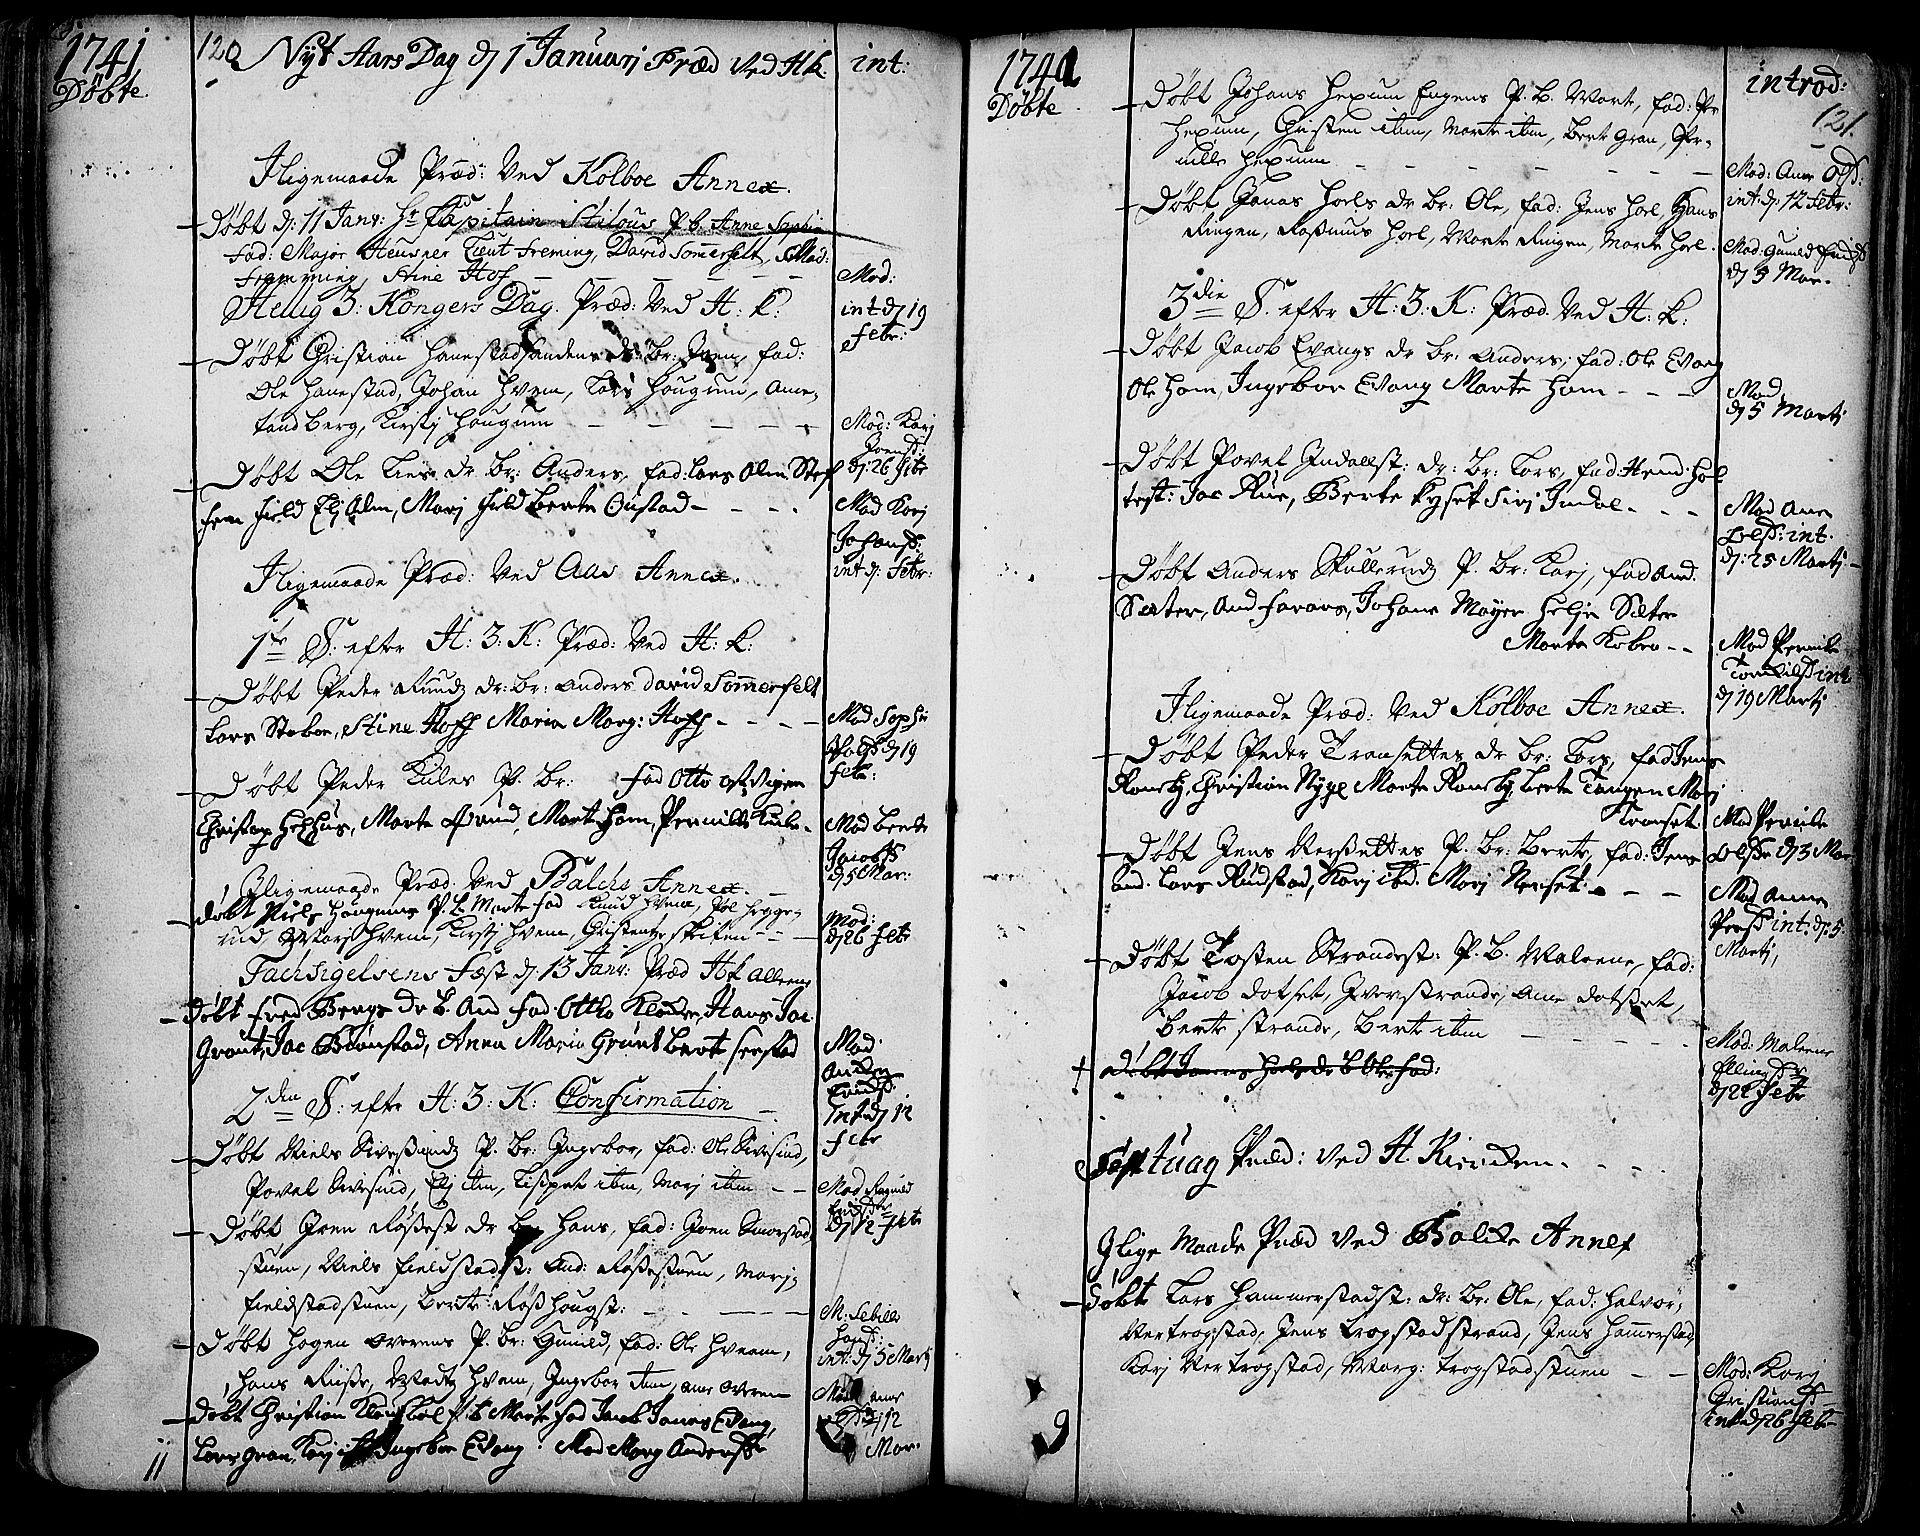 SAH, Toten prestekontor, Ministerialbok nr. 3, 1734-1751, s. 120-121